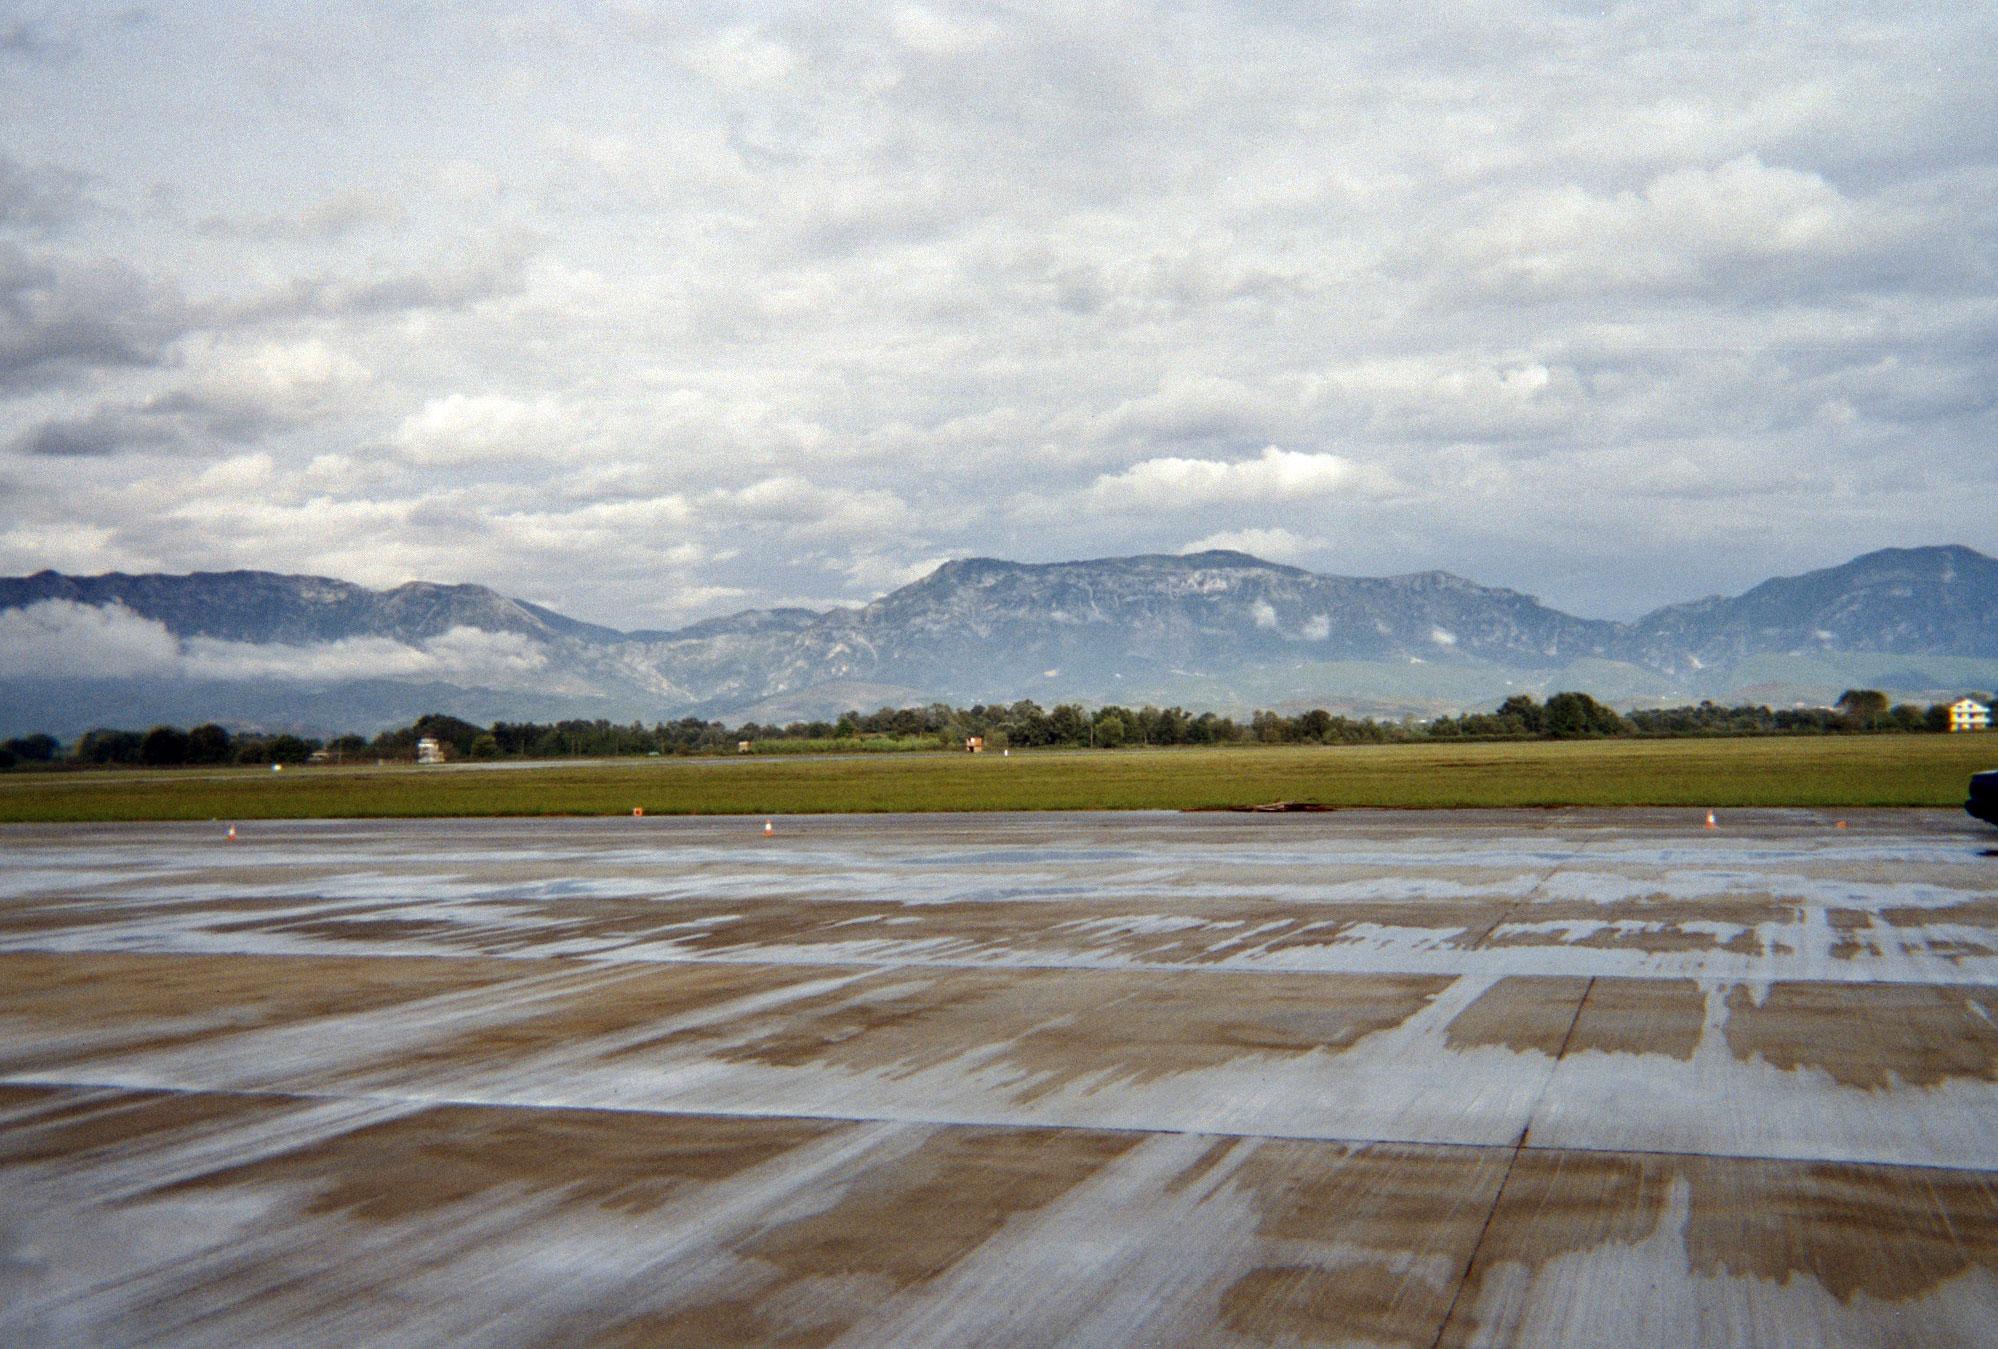 Rinas und Berge